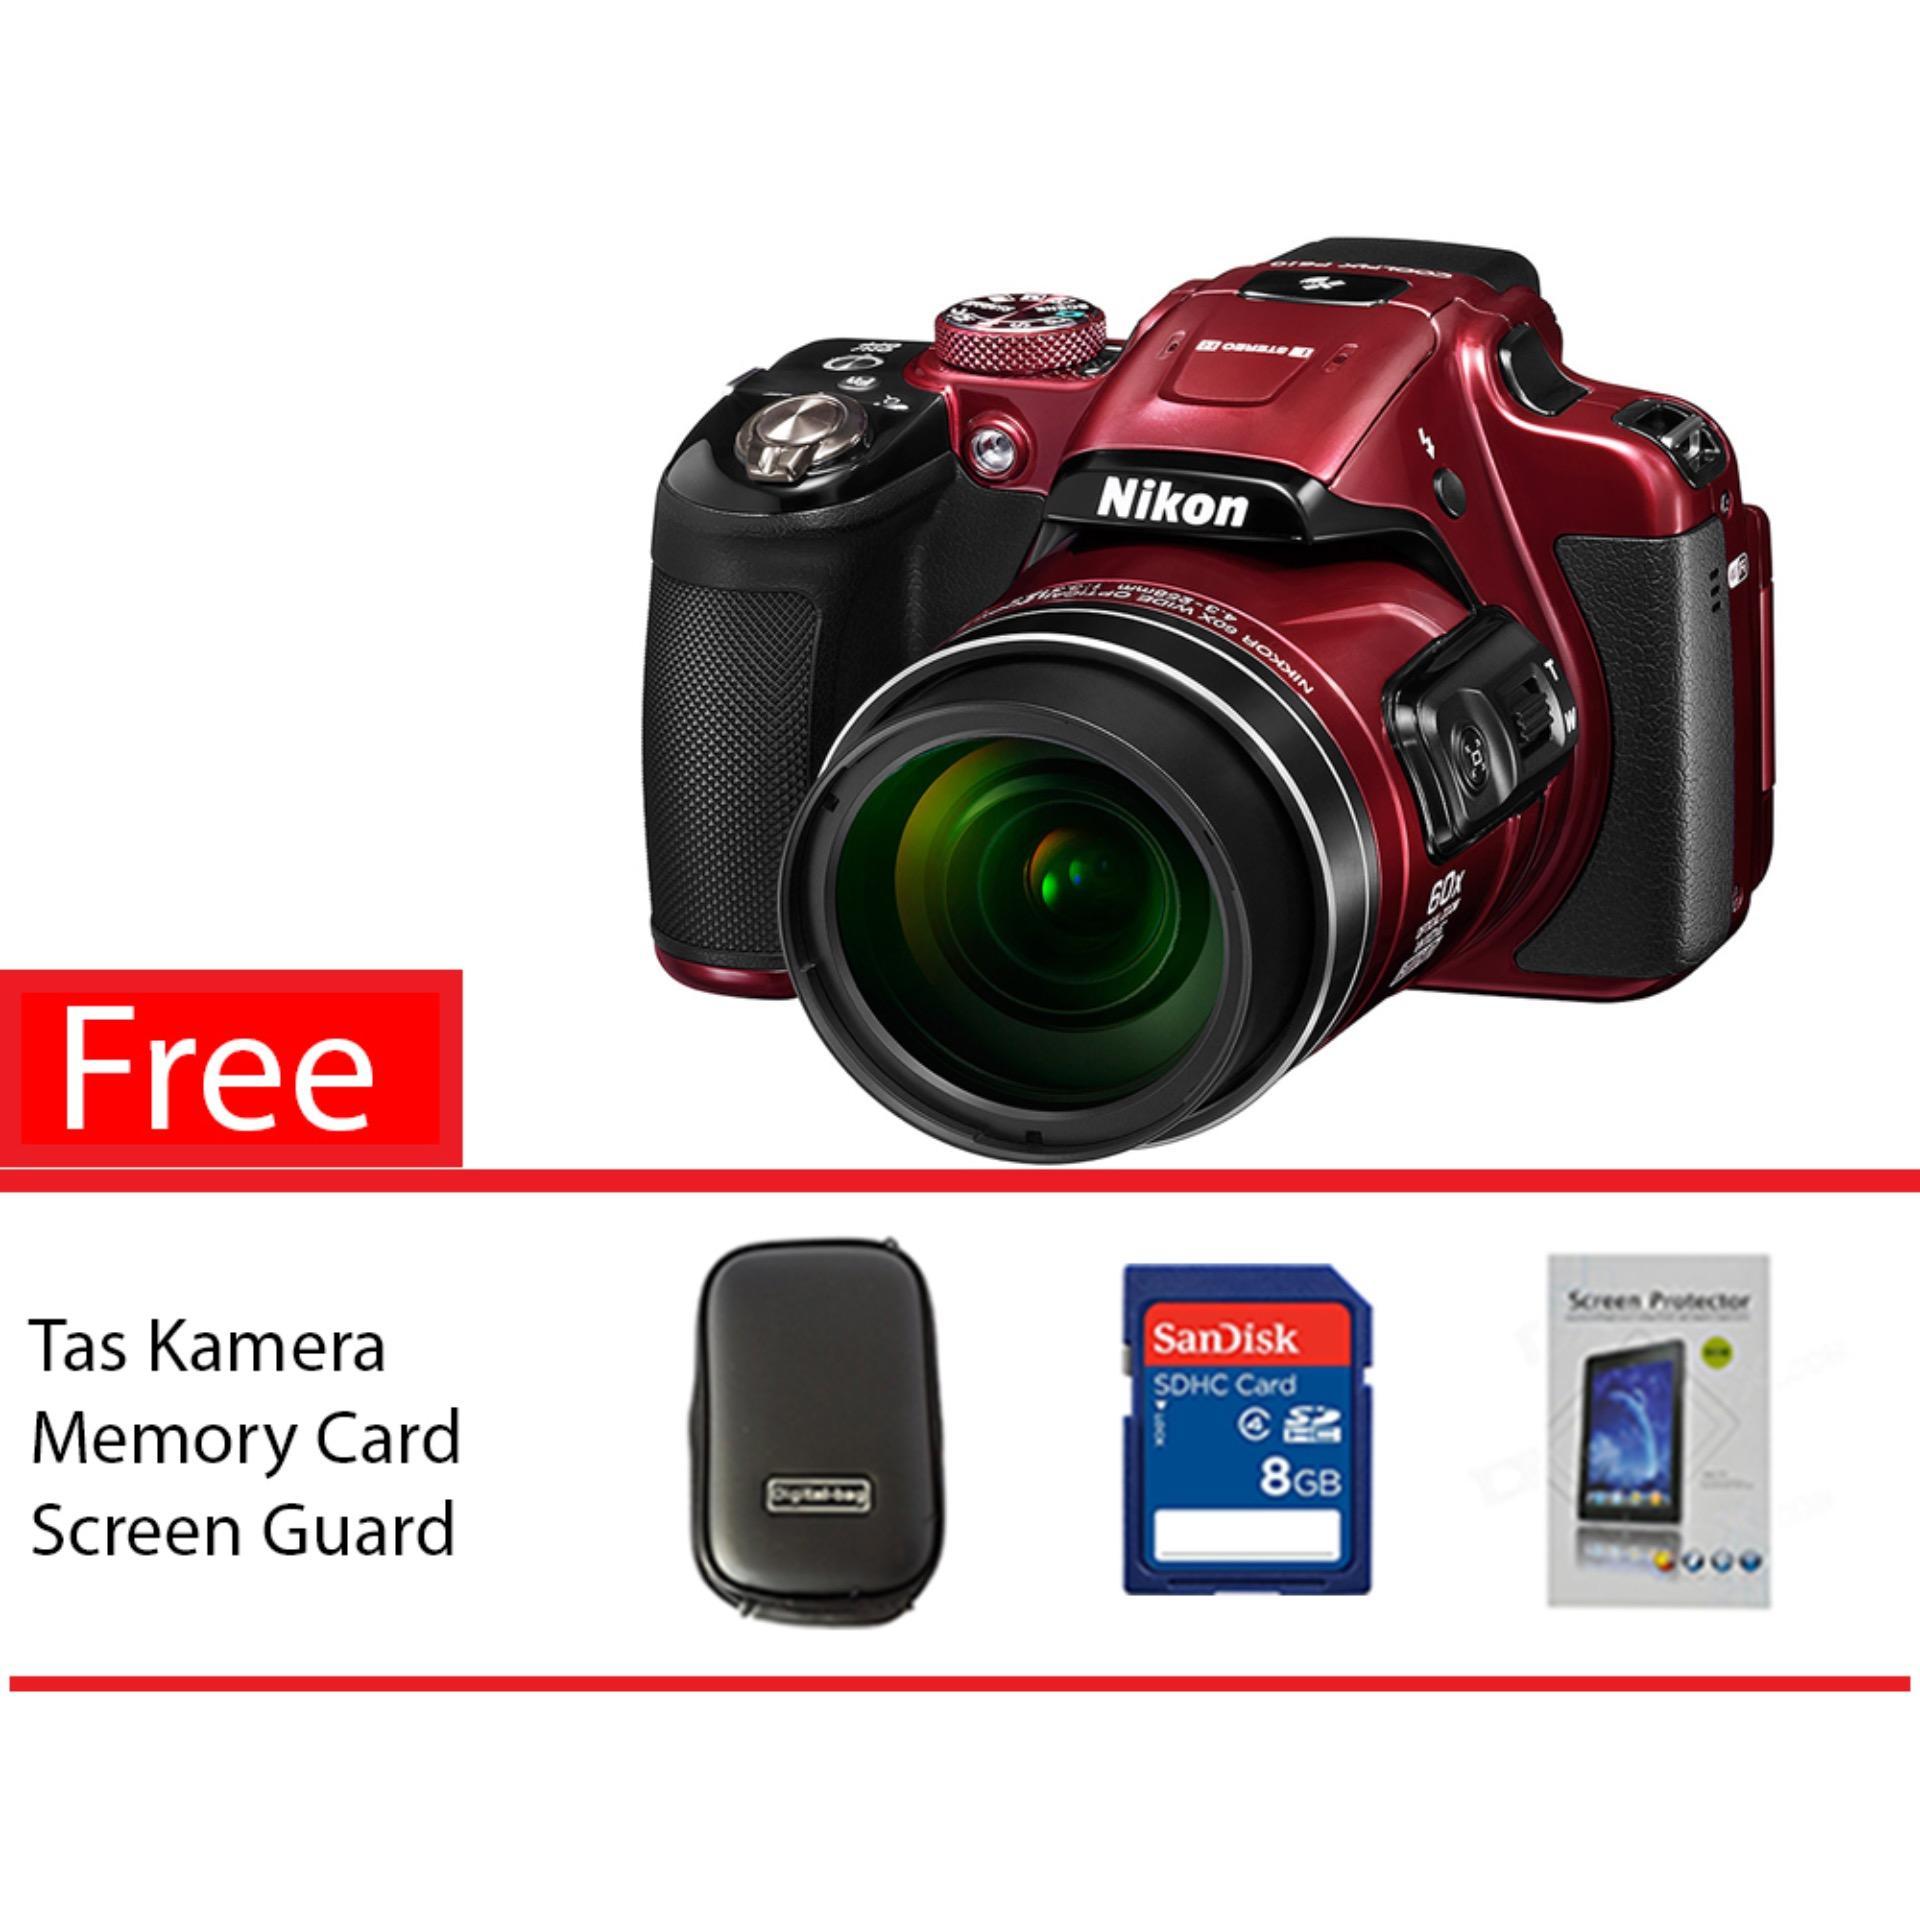 Nikon Coolpix B700 20MP Digital Camera Red Free Memory Card, Screen Guard, Tas Kamera